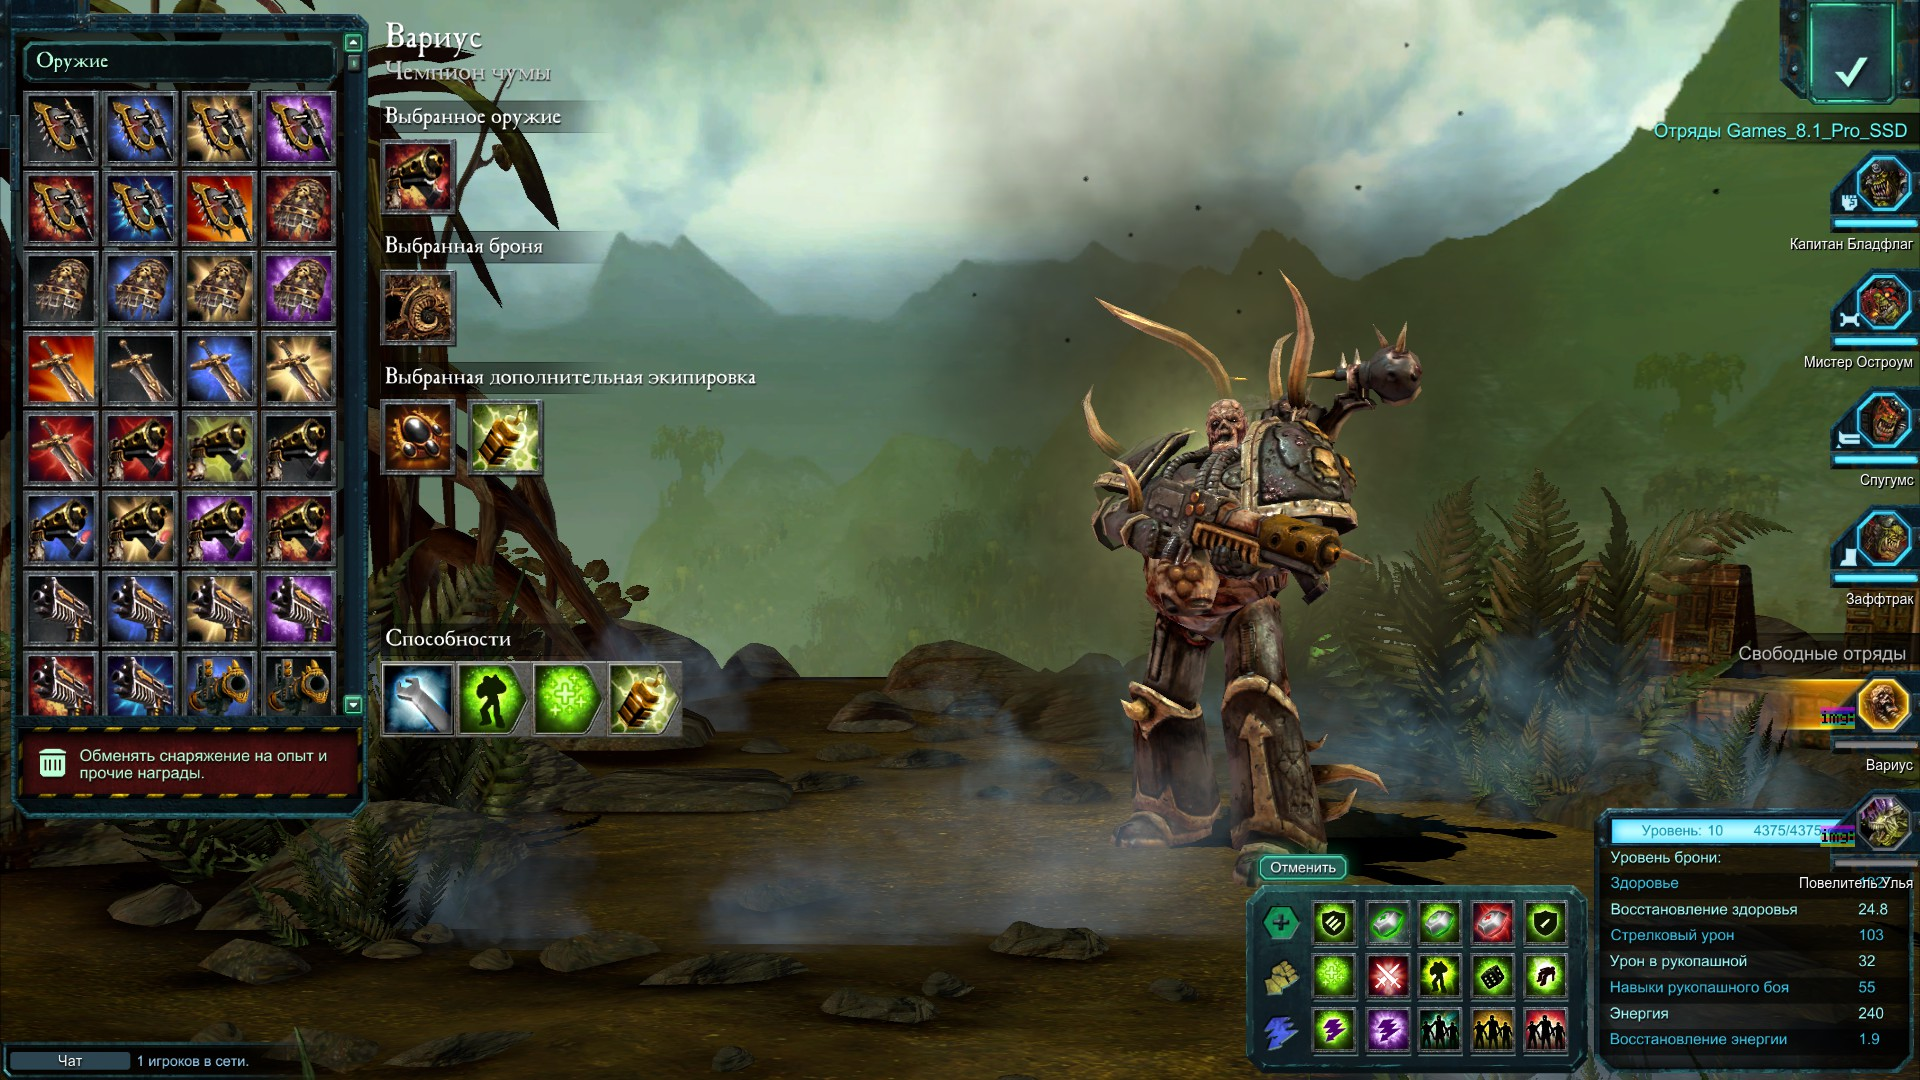 Orks (+2 Squads Mode) - Wargear_20170821005205_1.jpg - Warhammer 40.000: Dawn of War 2